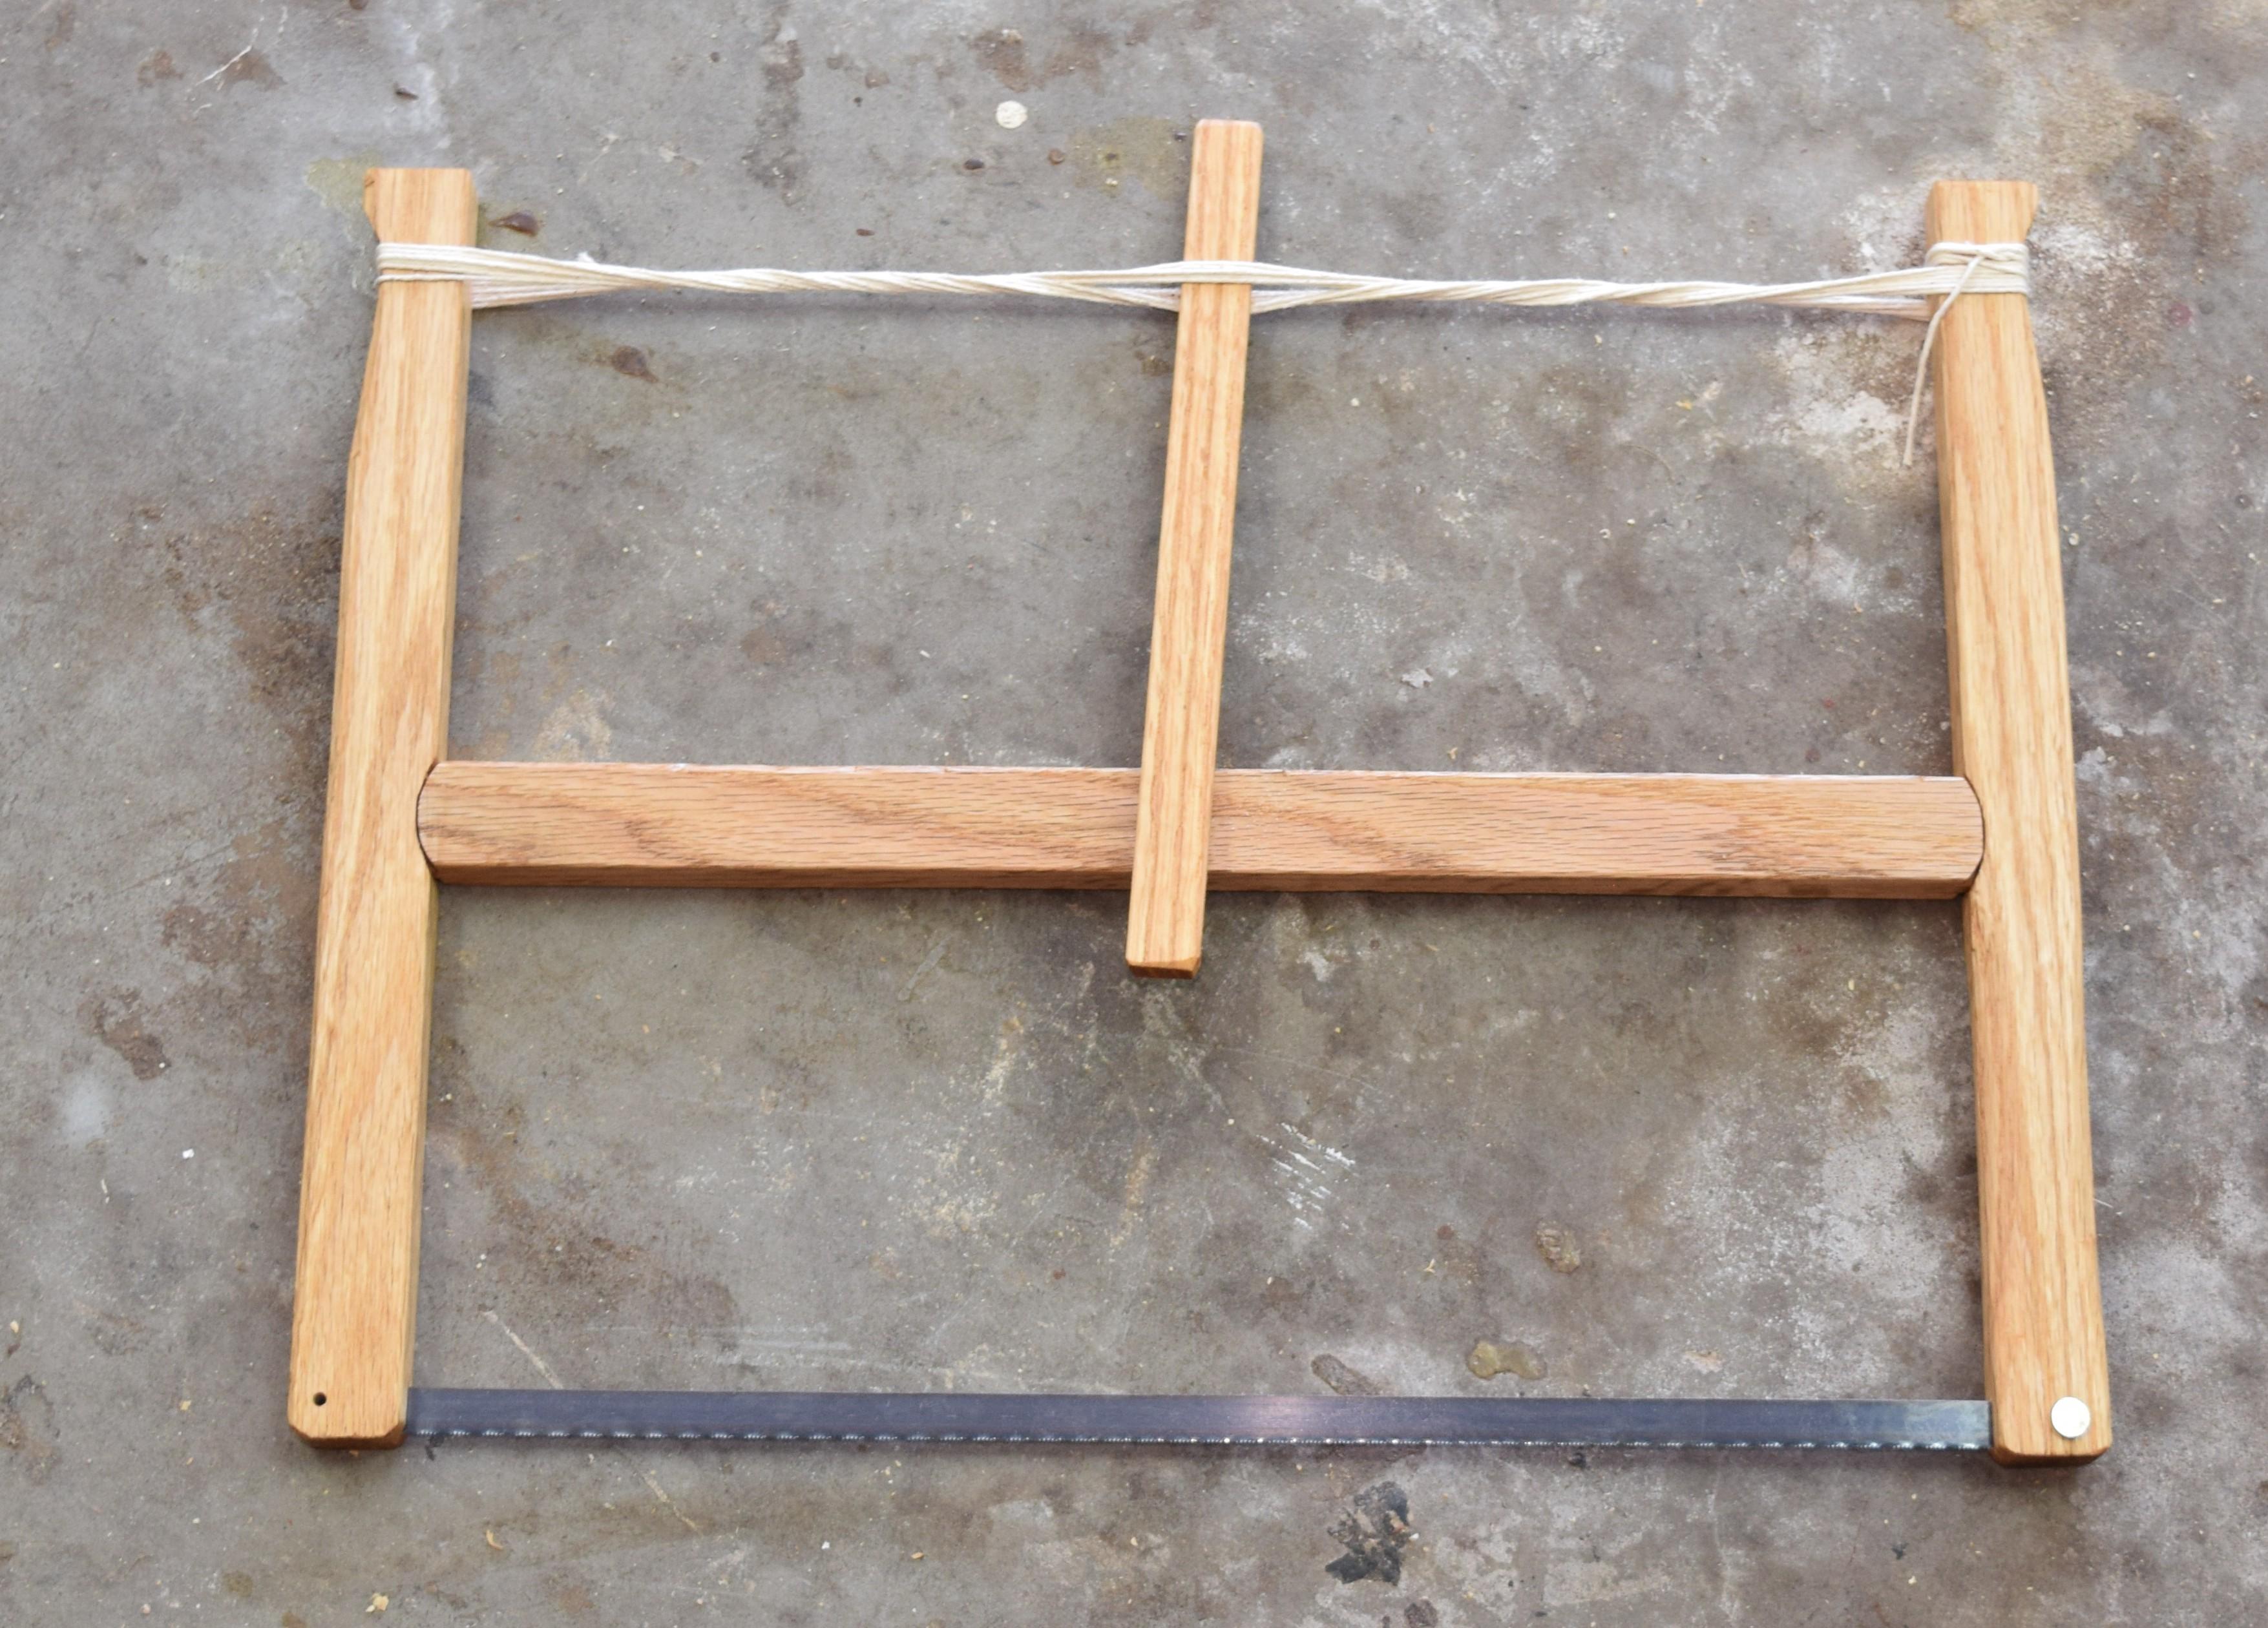 Frame Saw – Giant Hack Saw | Kilted Craft Works